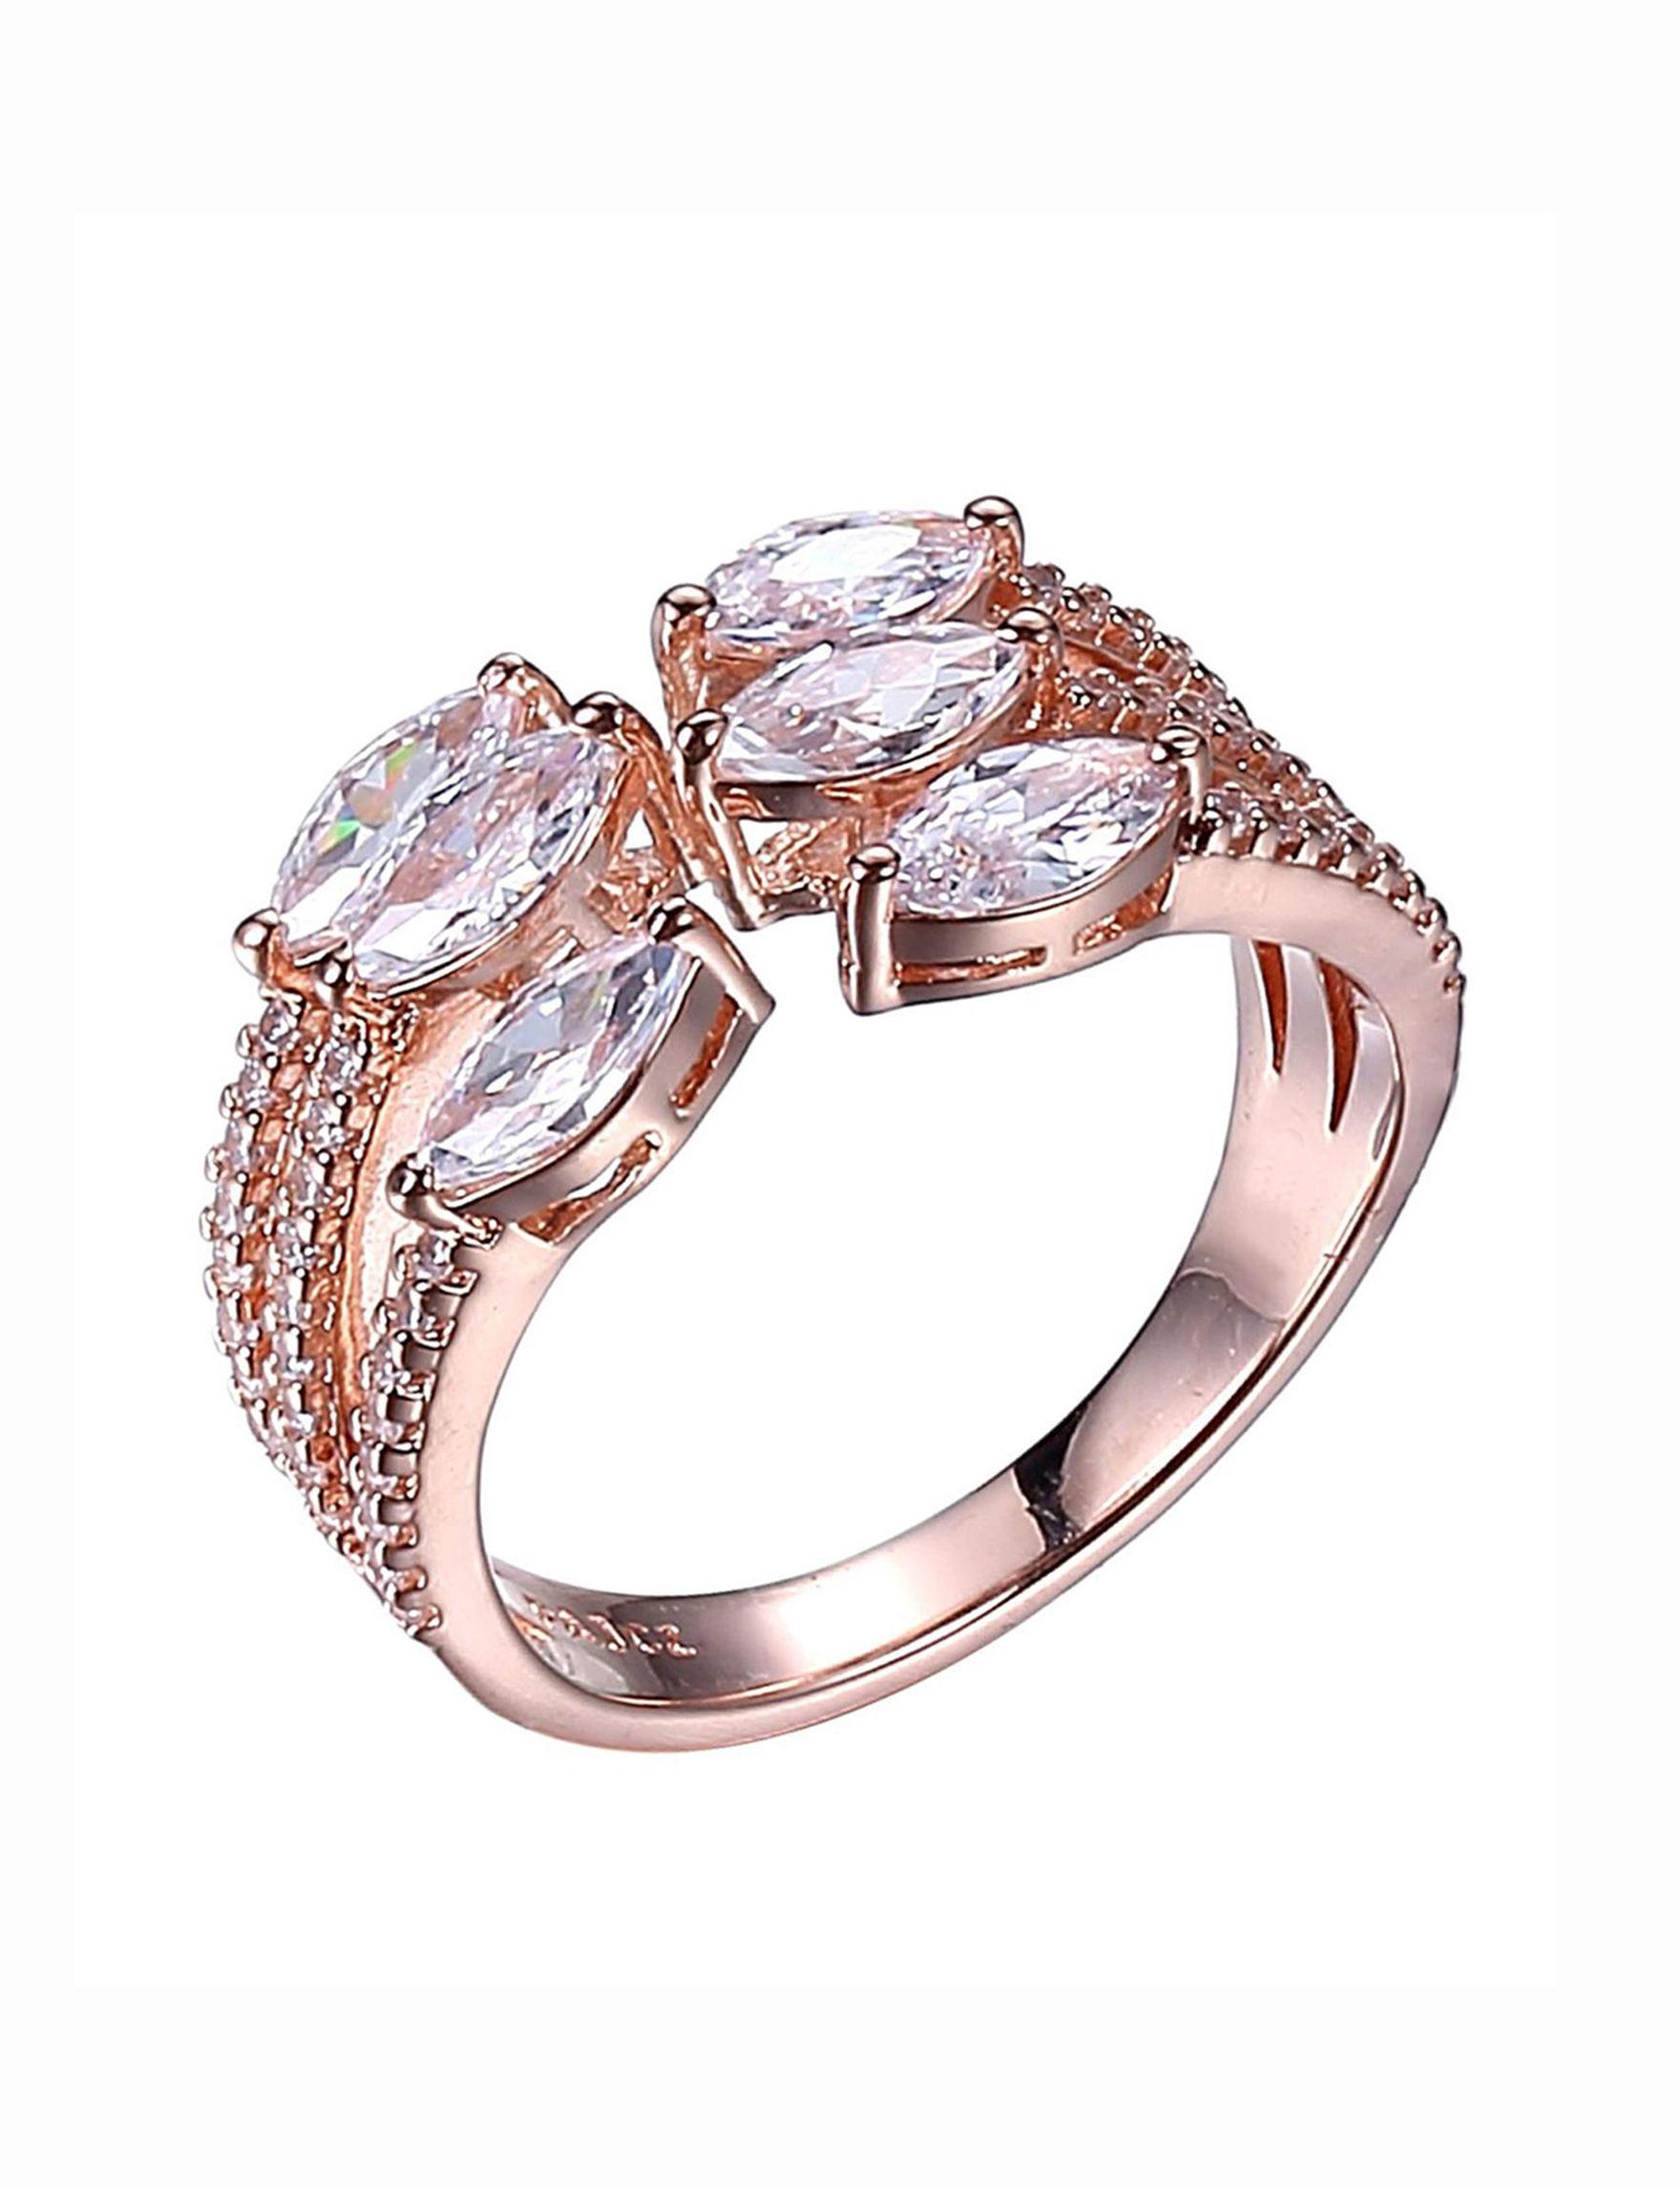 PAJ INC. Rose Gold / Crystal Rings Fine Jewelry